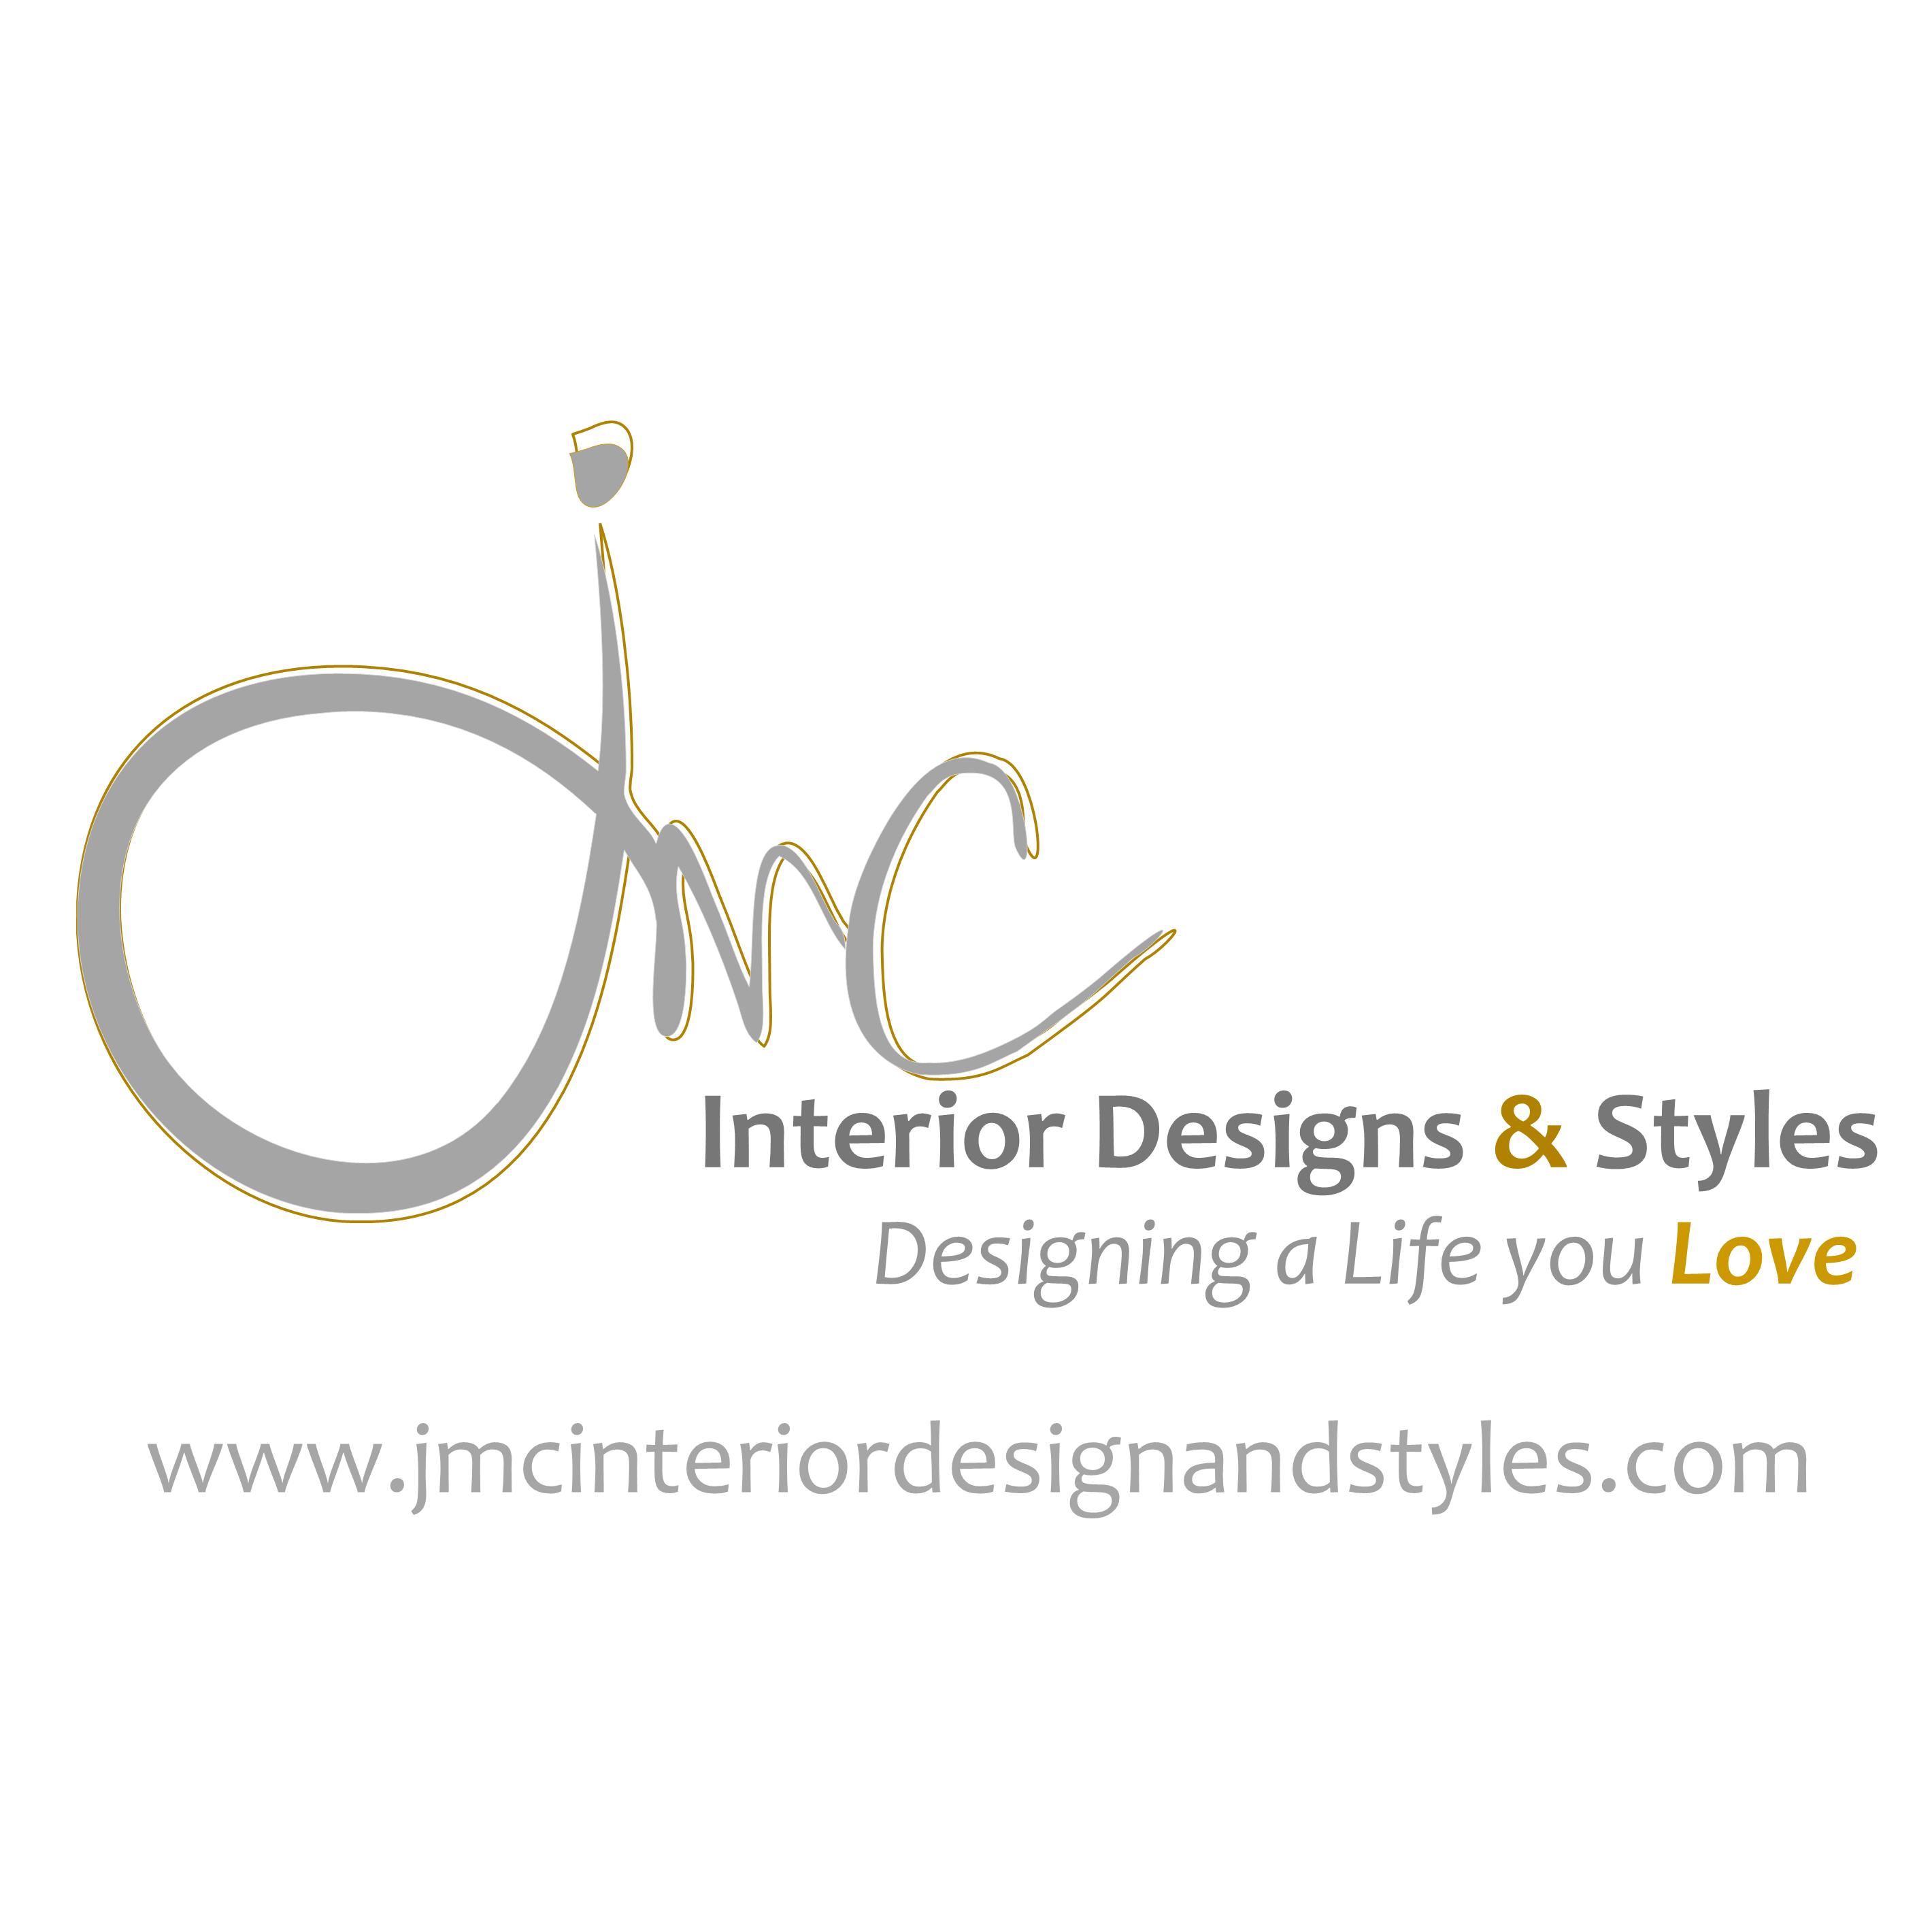 Jmc Interior Designs & Styles image 1